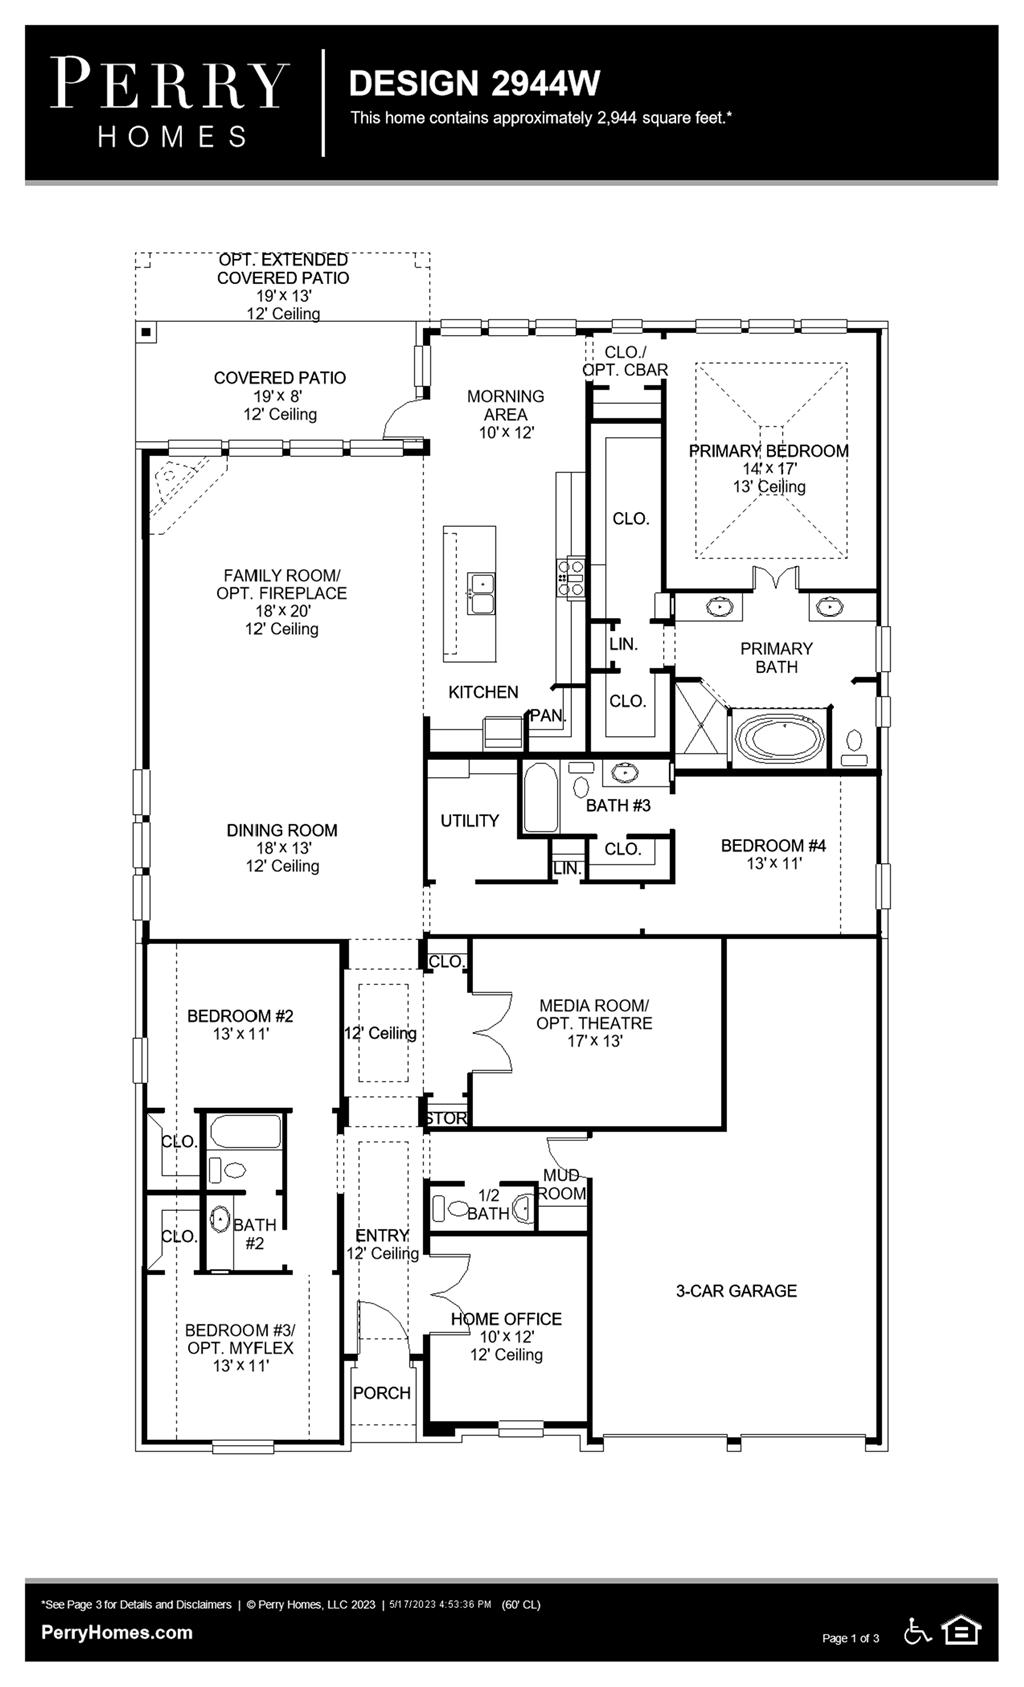 Floor Plan for 2944W